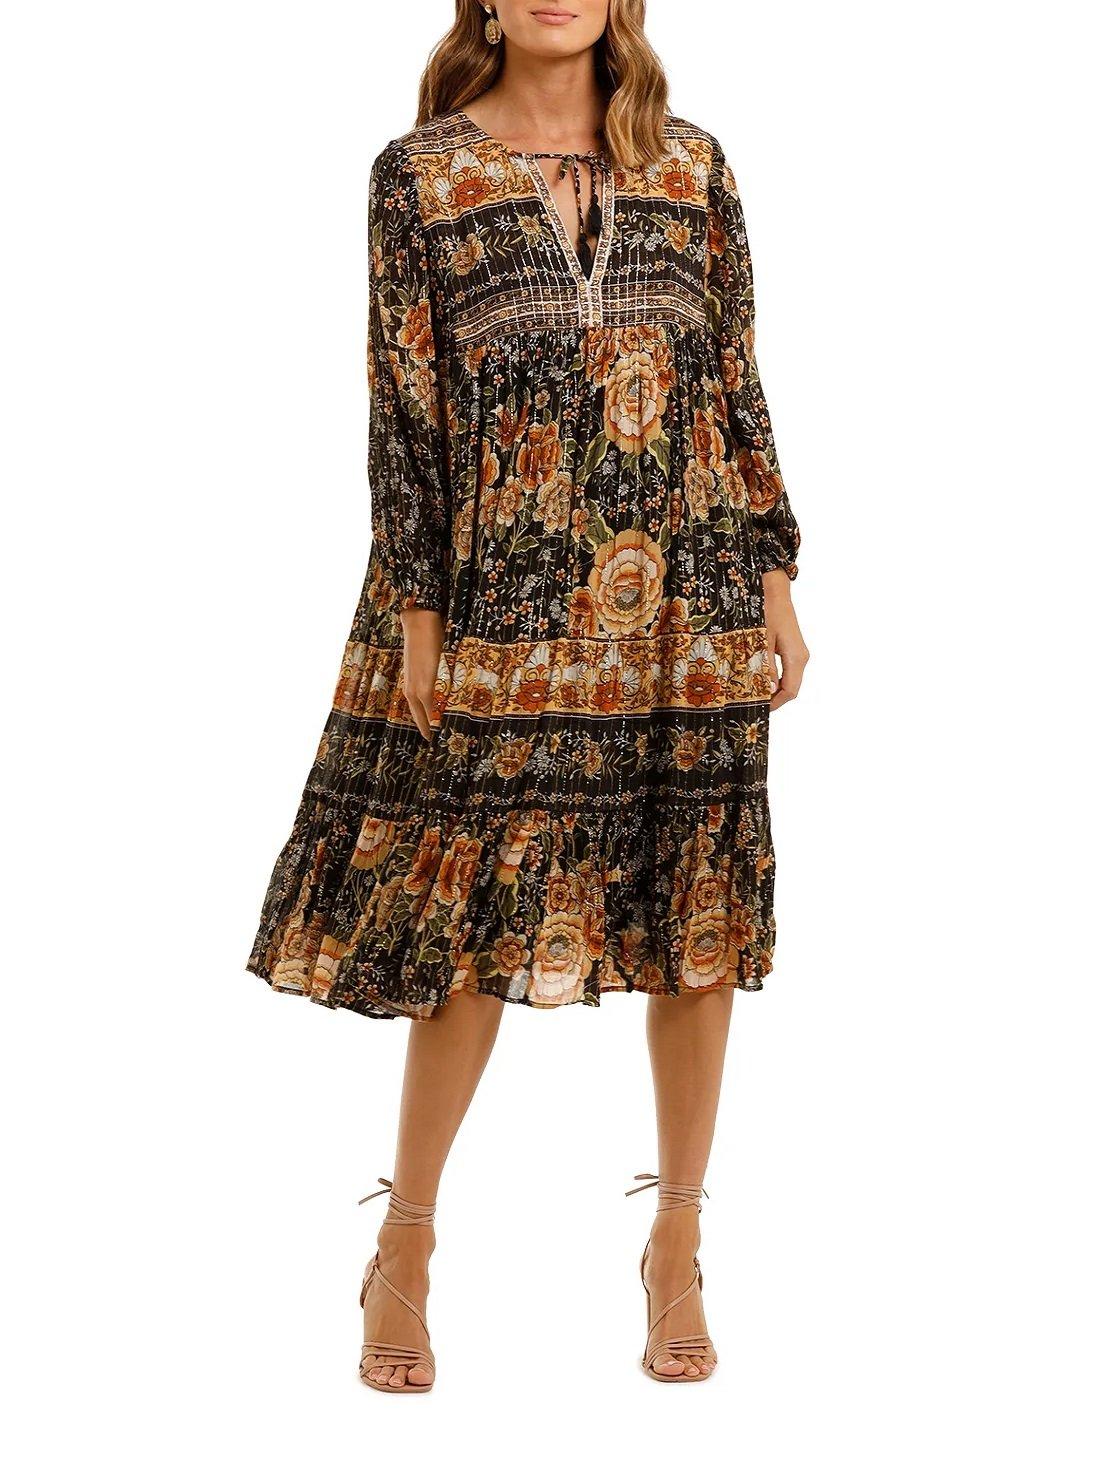 Mystic Boho Dress in Nightfall